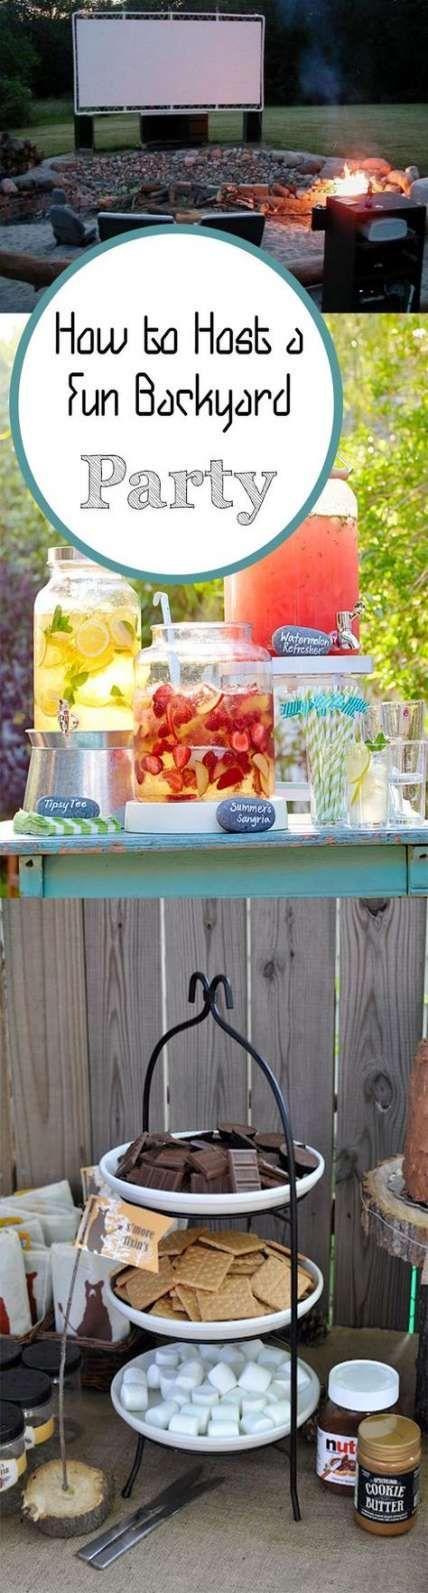 Backyard party ideas for adults birthdays families 53 Best ideas